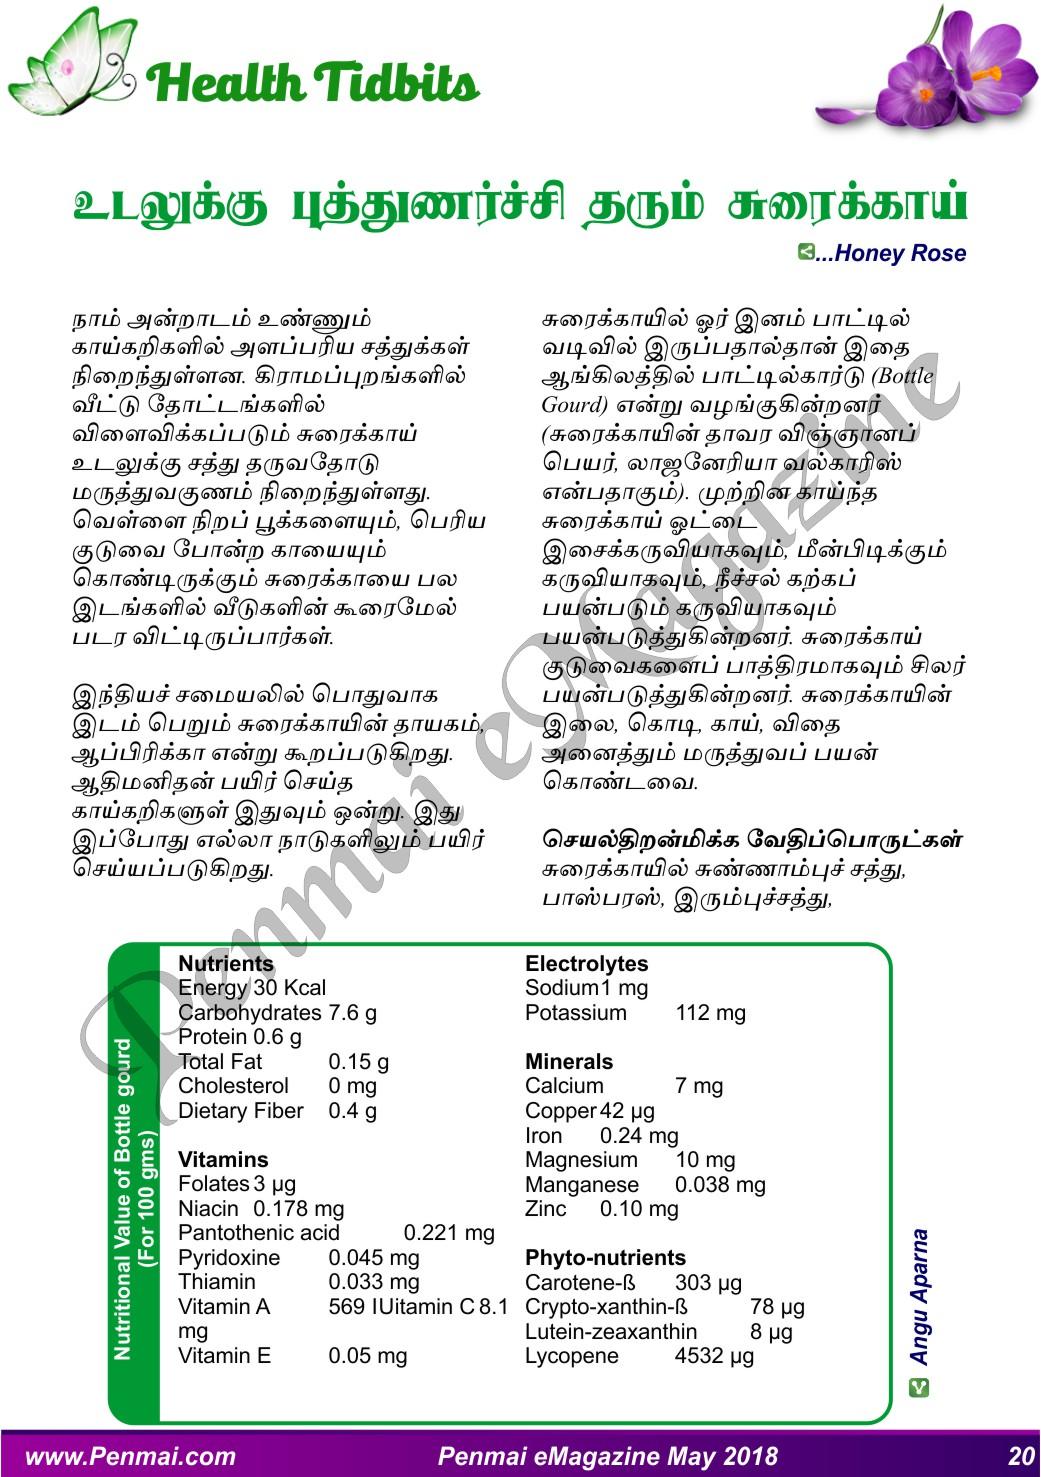 Penmai-eMagazine-May-2018-20.jpg